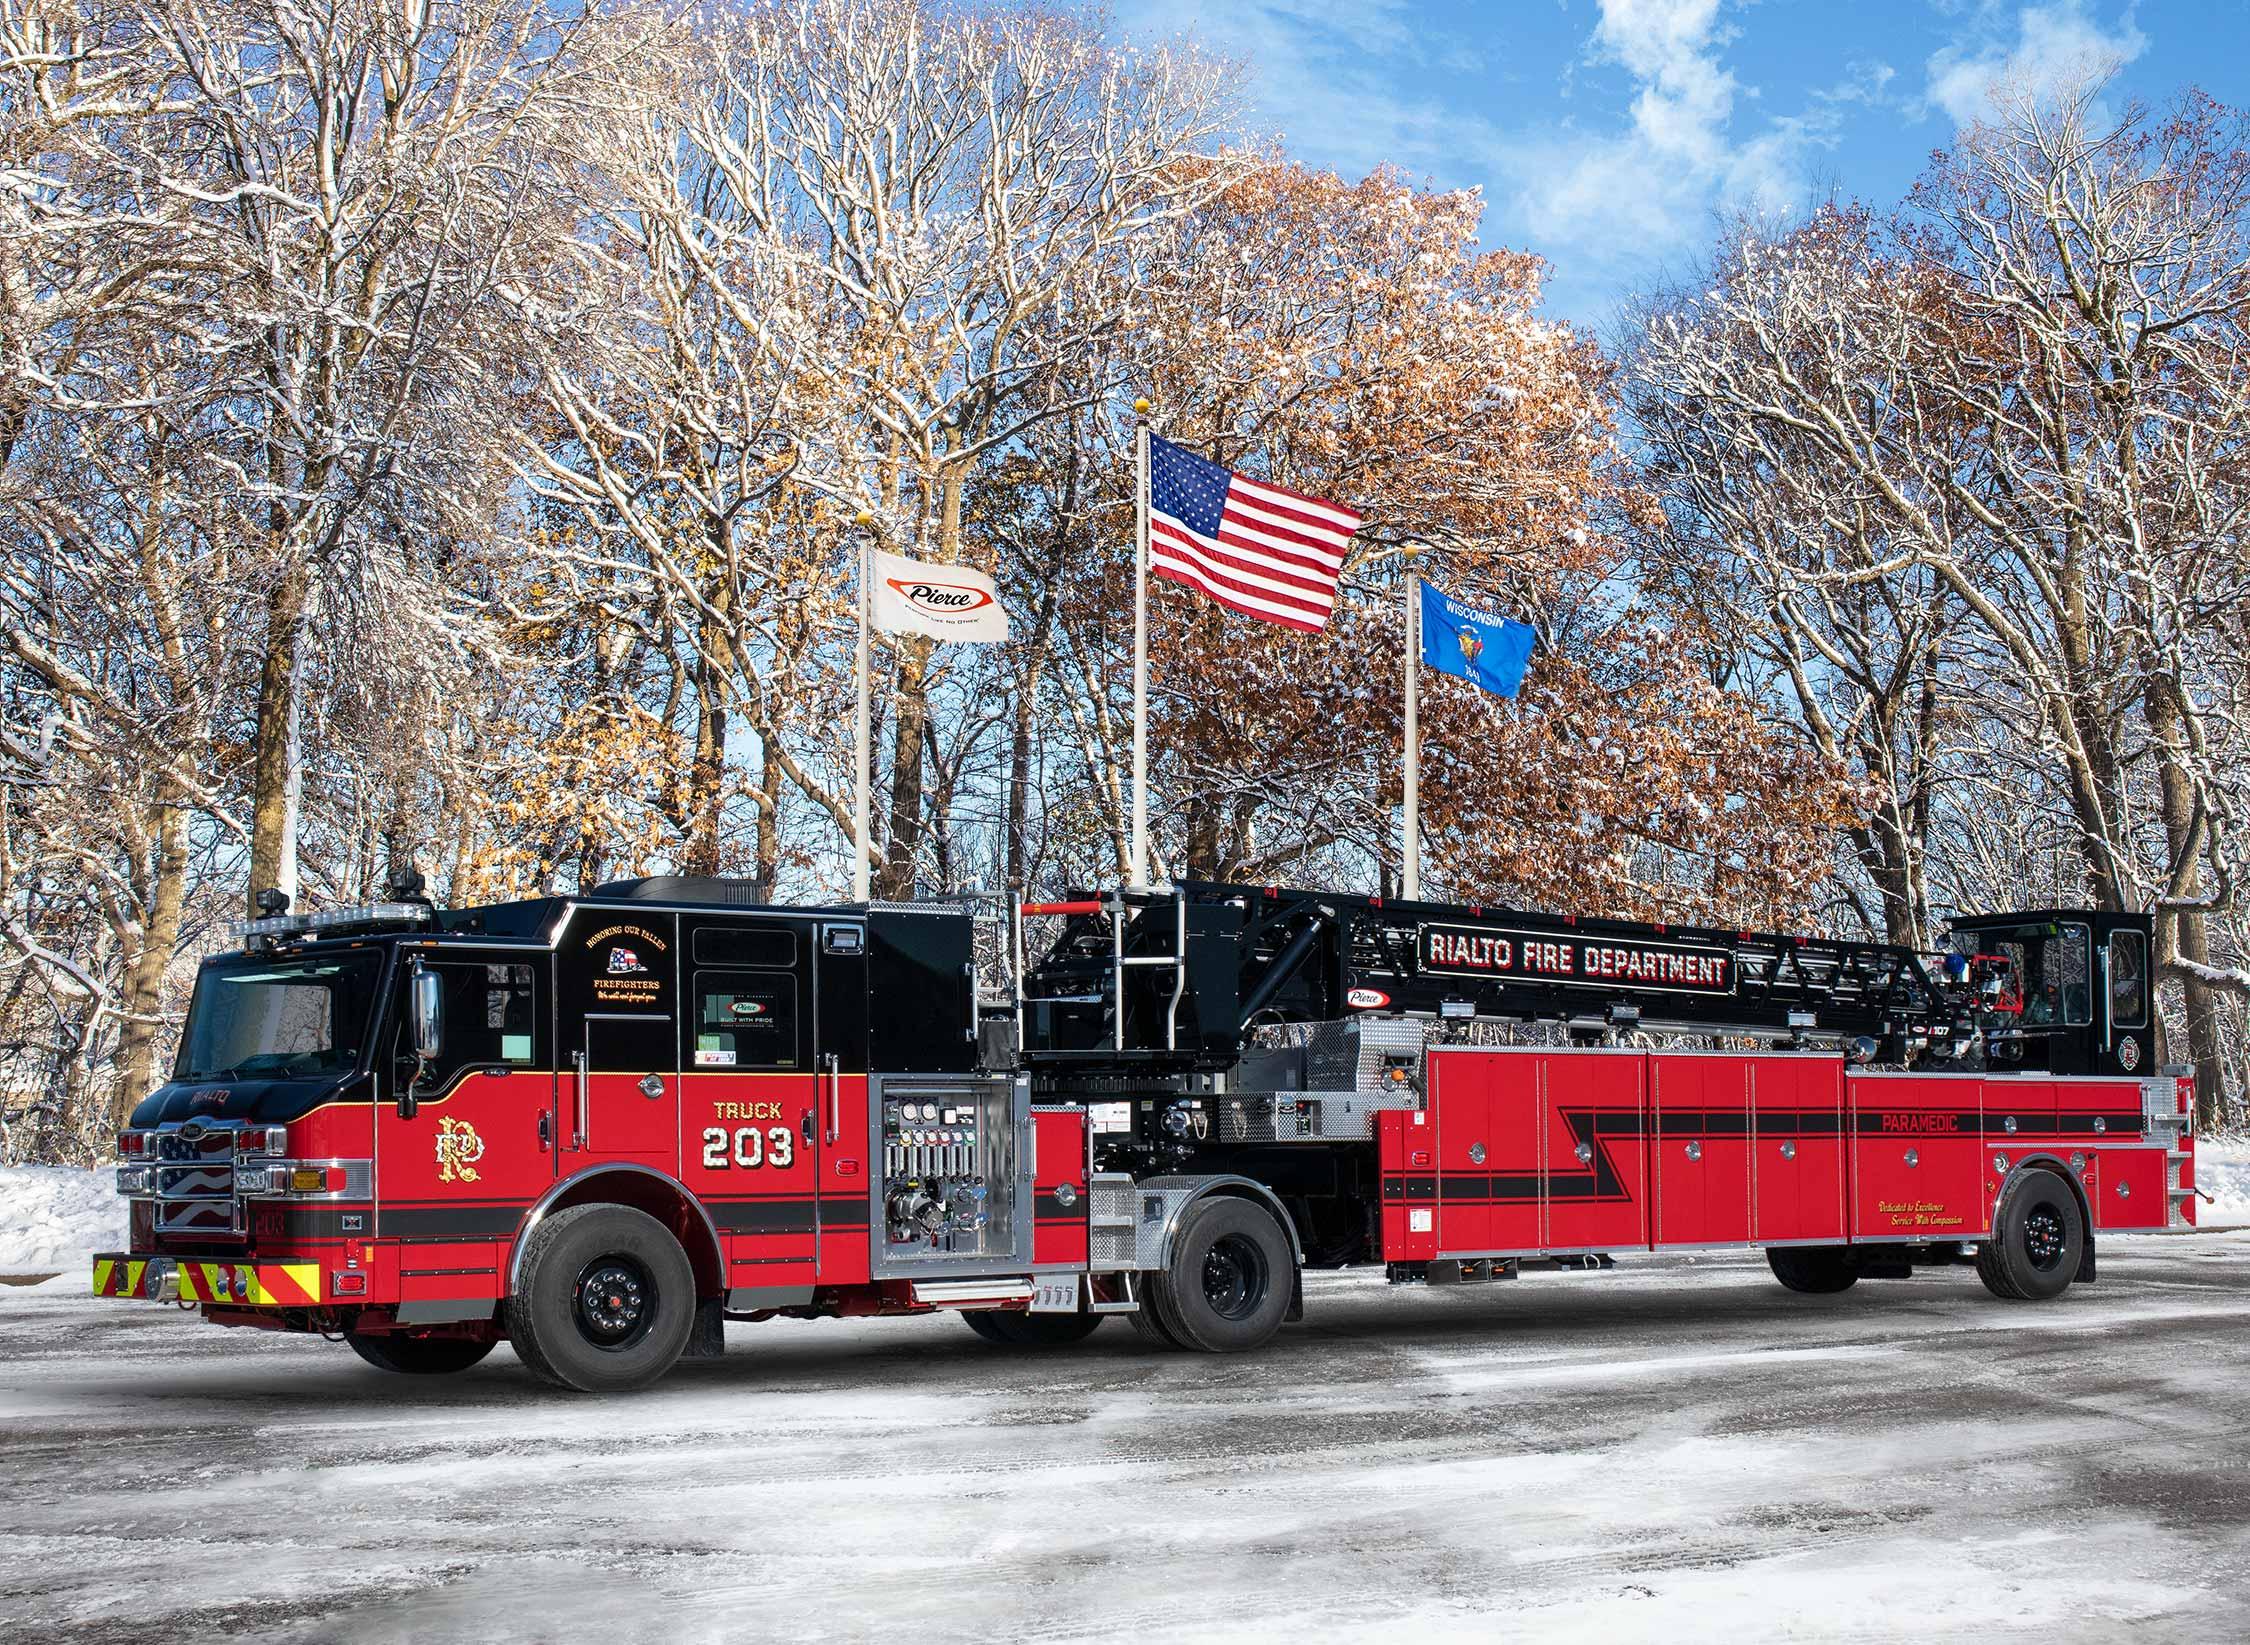 Rialto Fire Department - Aerial